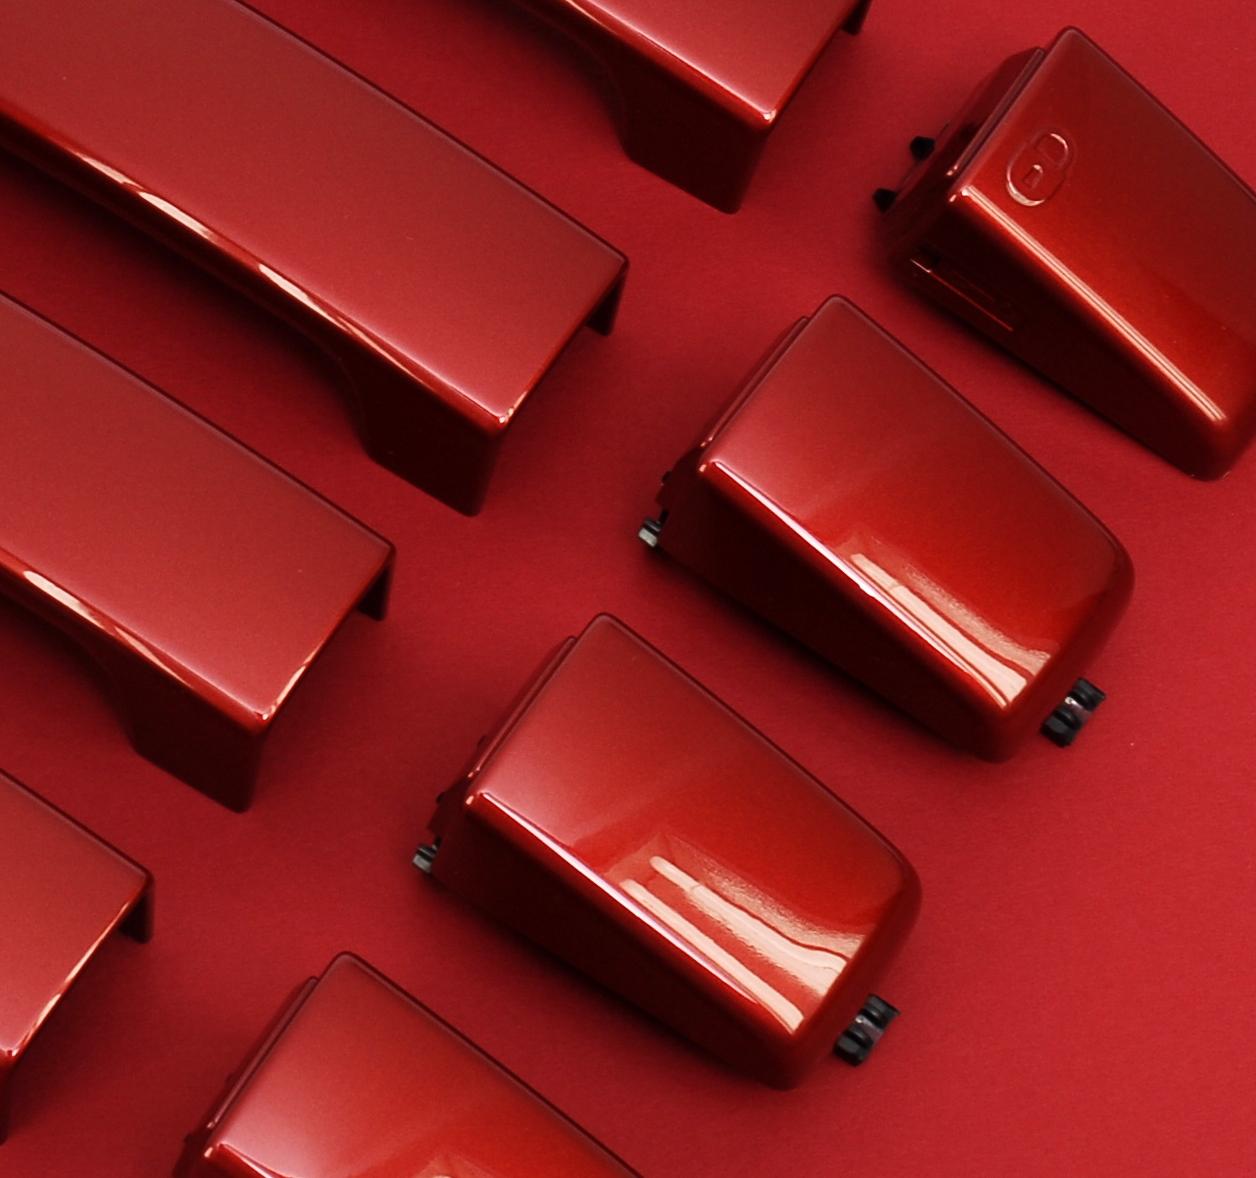 genuine replacement door handle skins for range rover. Black Bedroom Furniture Sets. Home Design Ideas